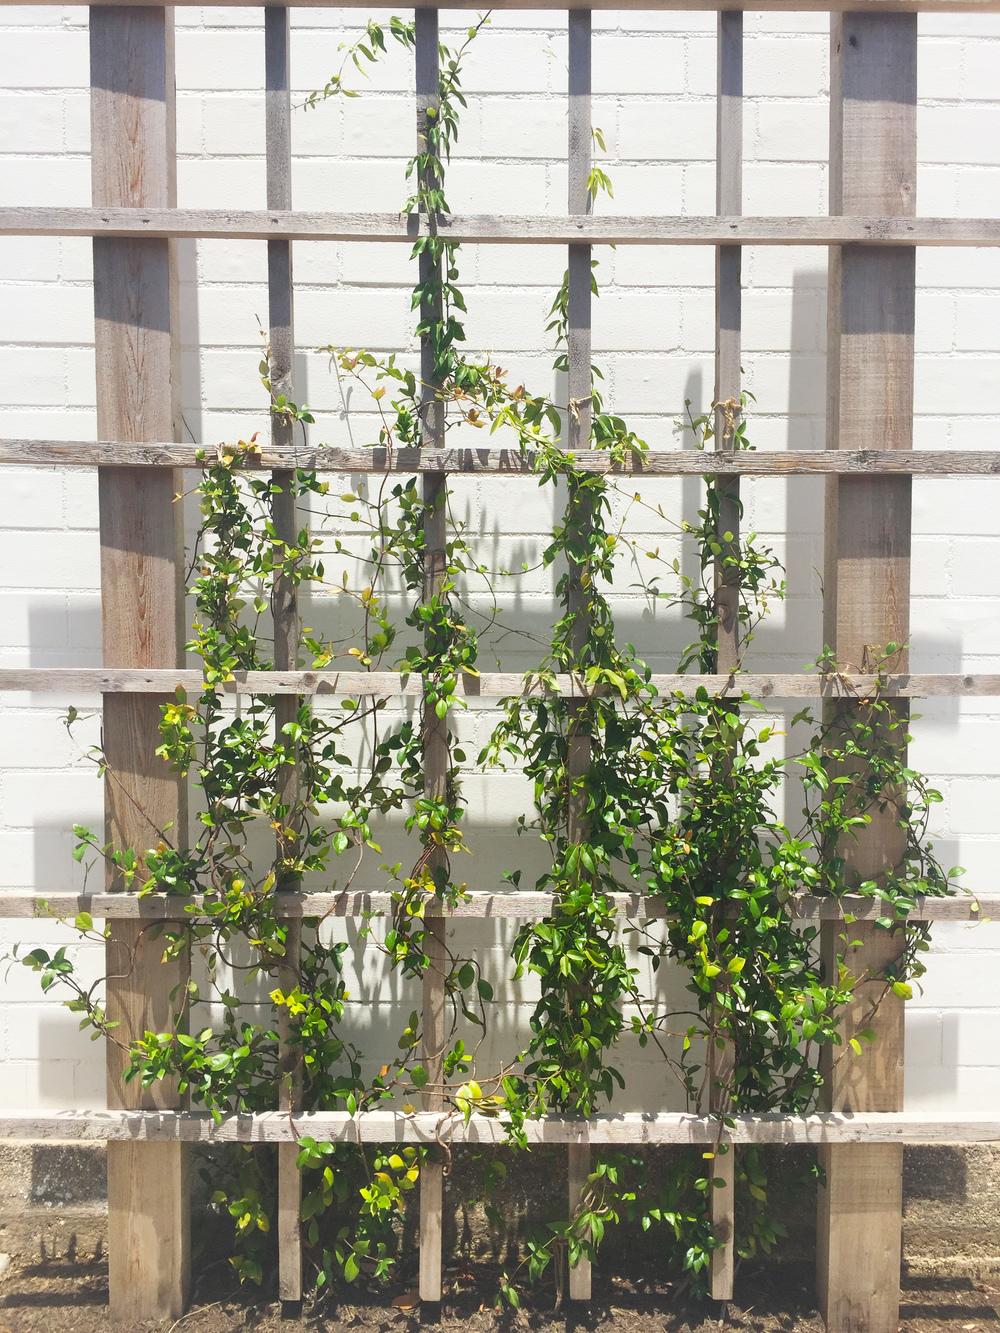 gardenwall.jpg